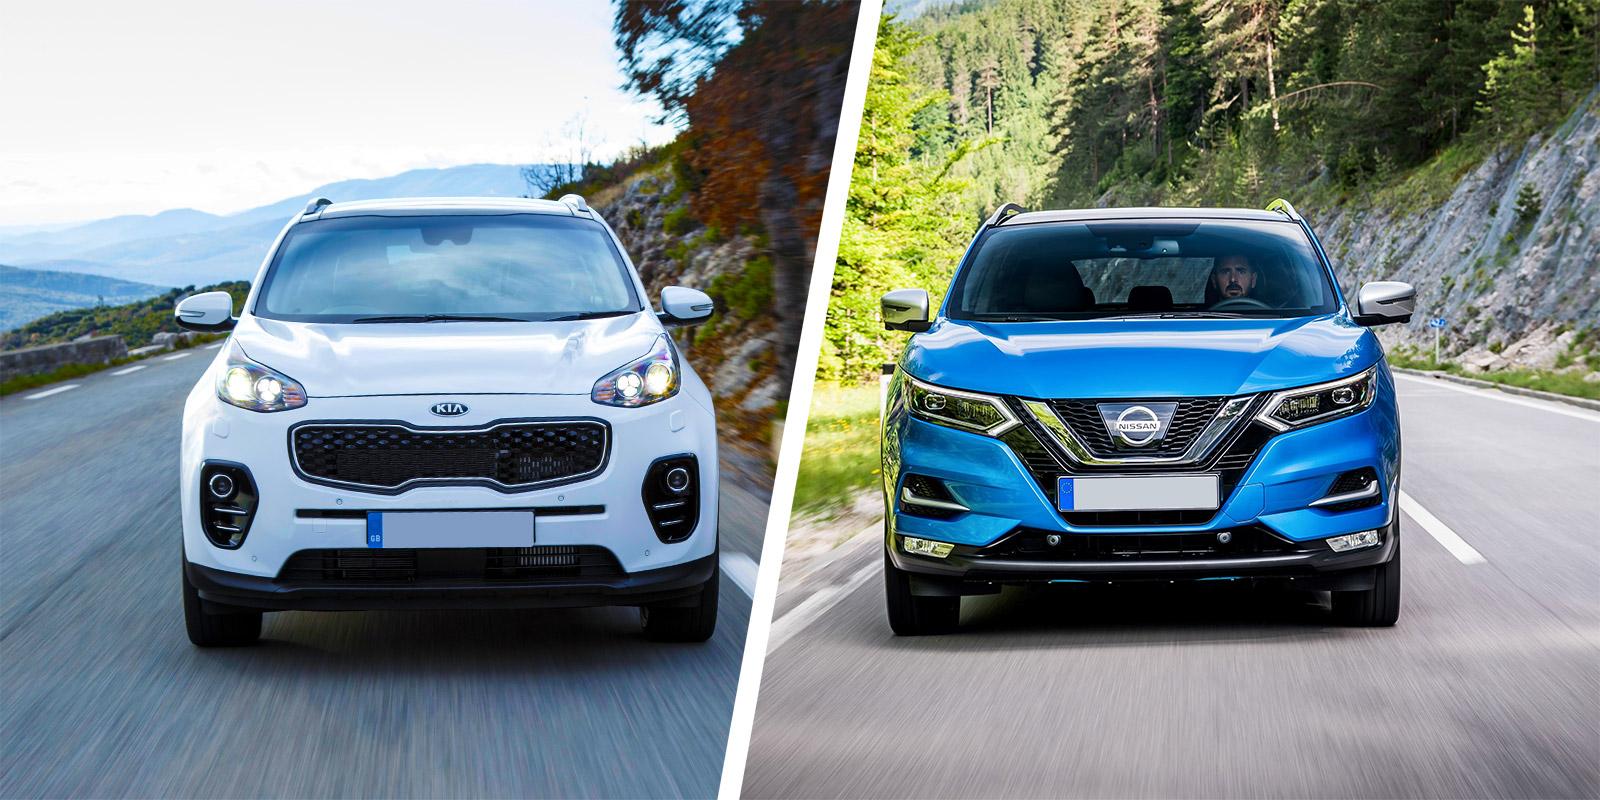 Kia Sportage Vs Nissan Qashqai Which Is Best Carwow